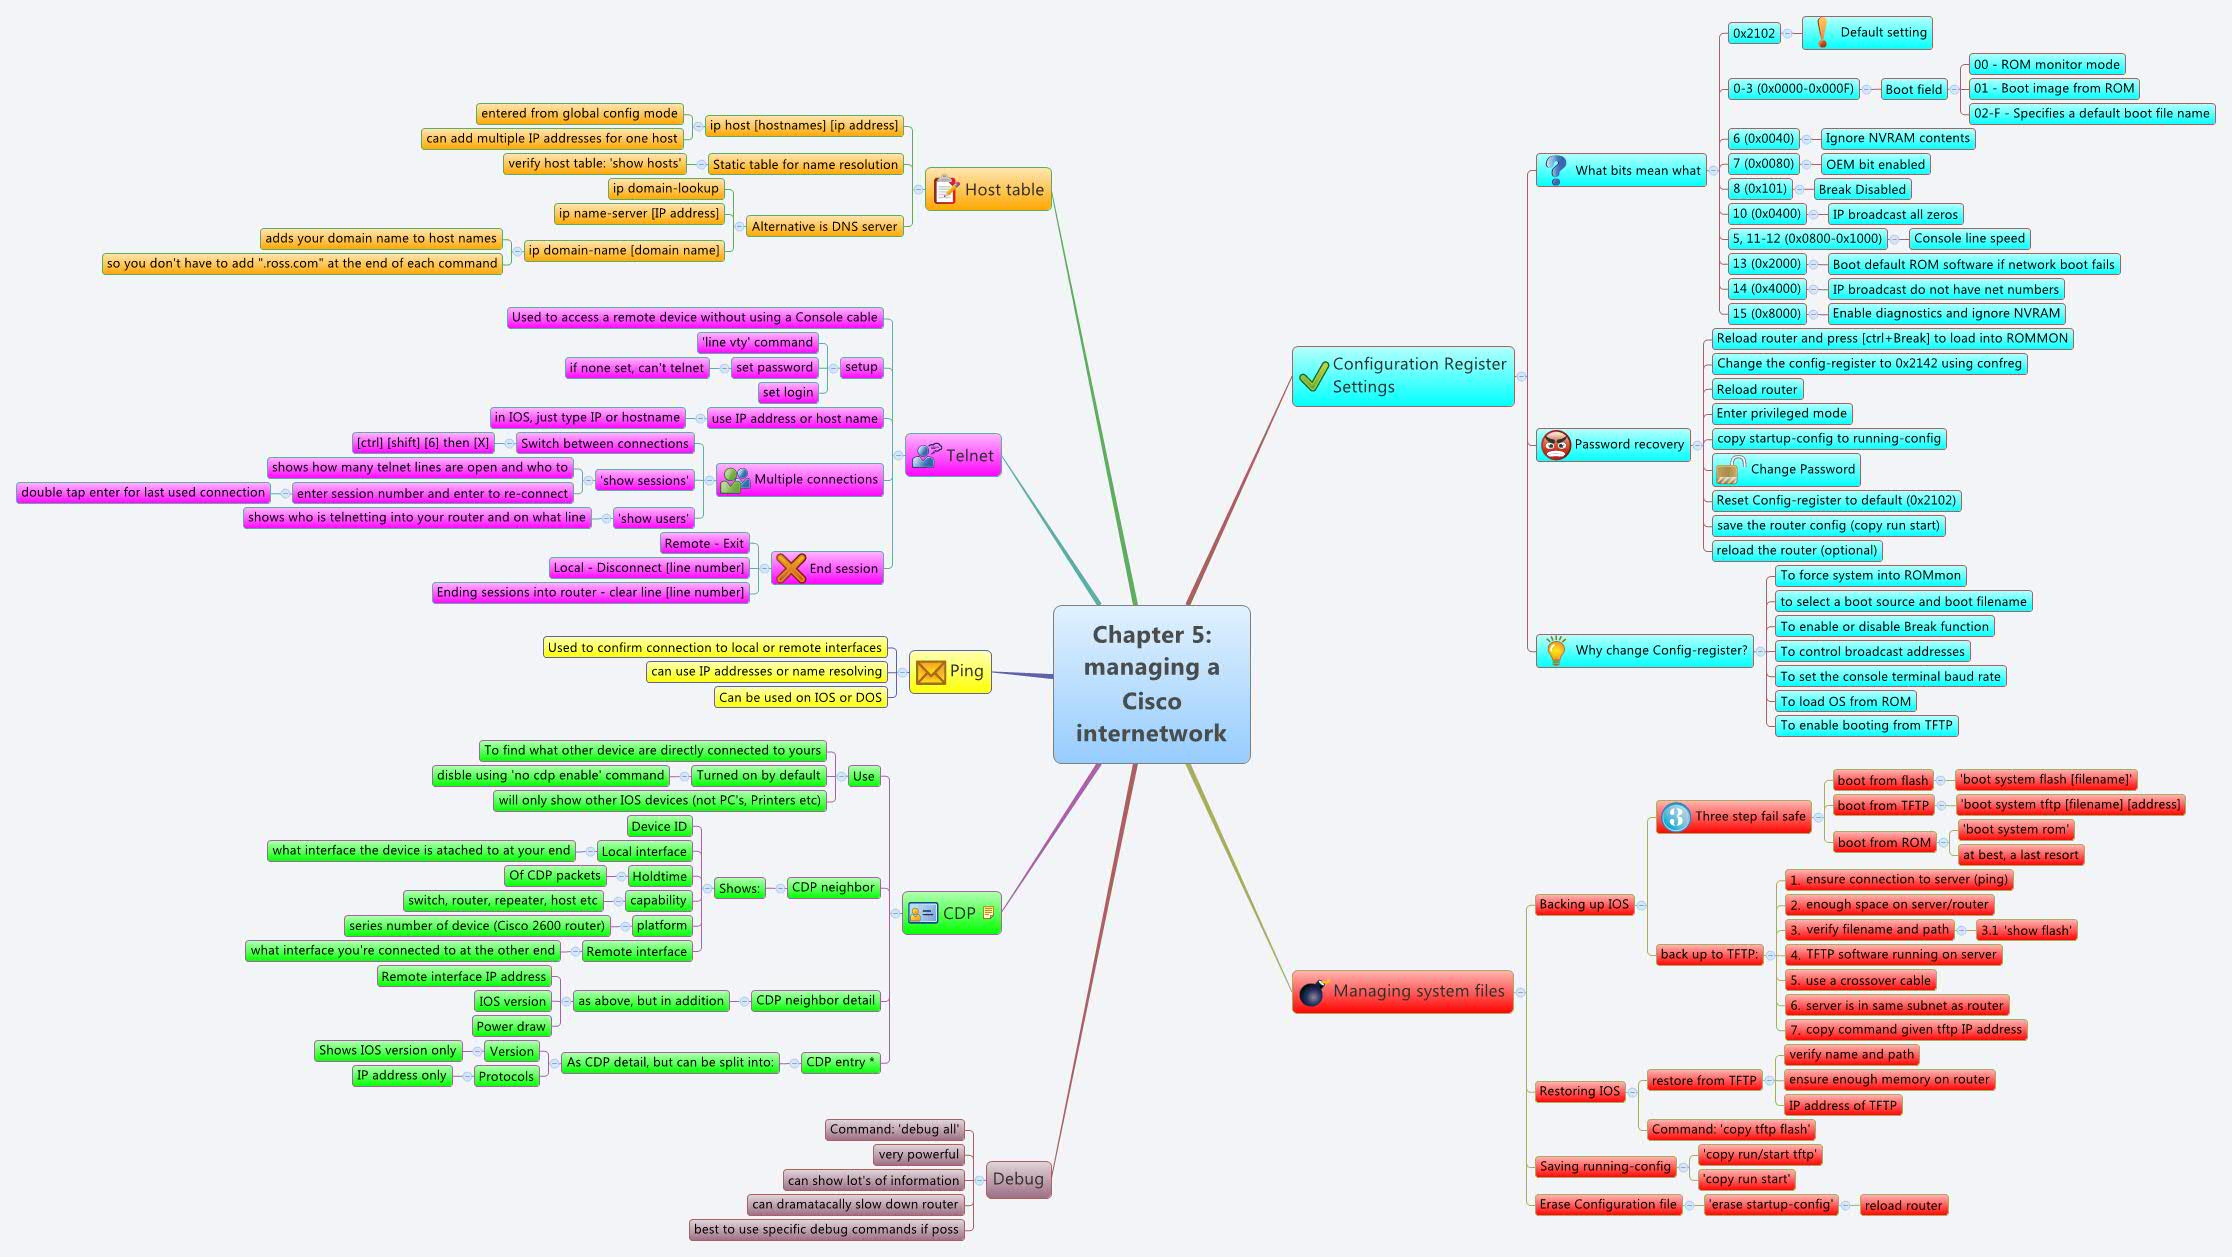 Chapter 5: managing a Cisco internetwork - XMind - Mind